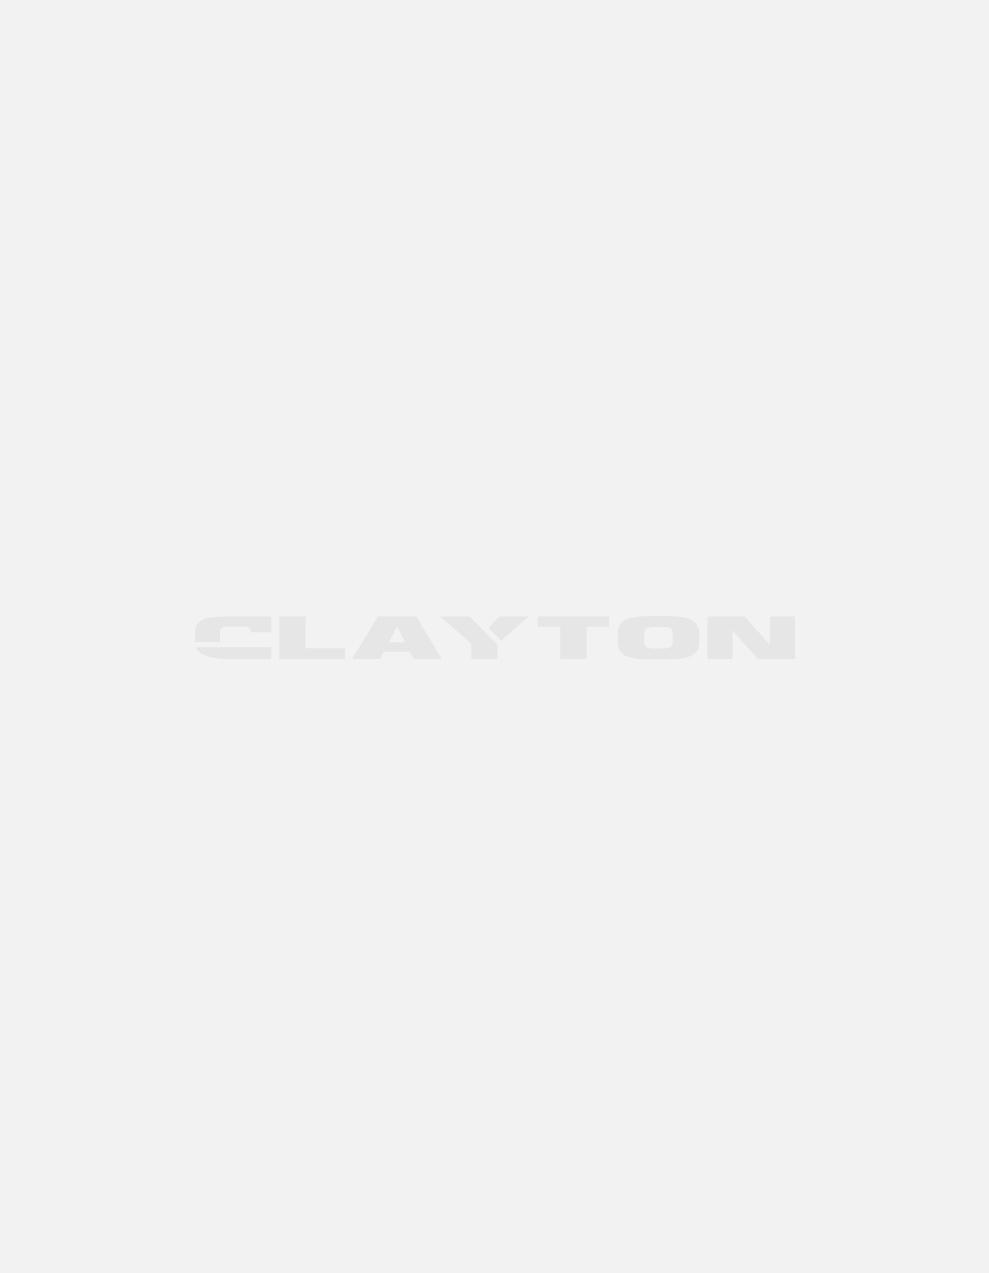 https://www.claytonitalia.com/media/catalog/product/cache/5/small_image/460x590/9df78eab33525d08d6e5fb8d27136e95/g/i/gift56_nt.jpg